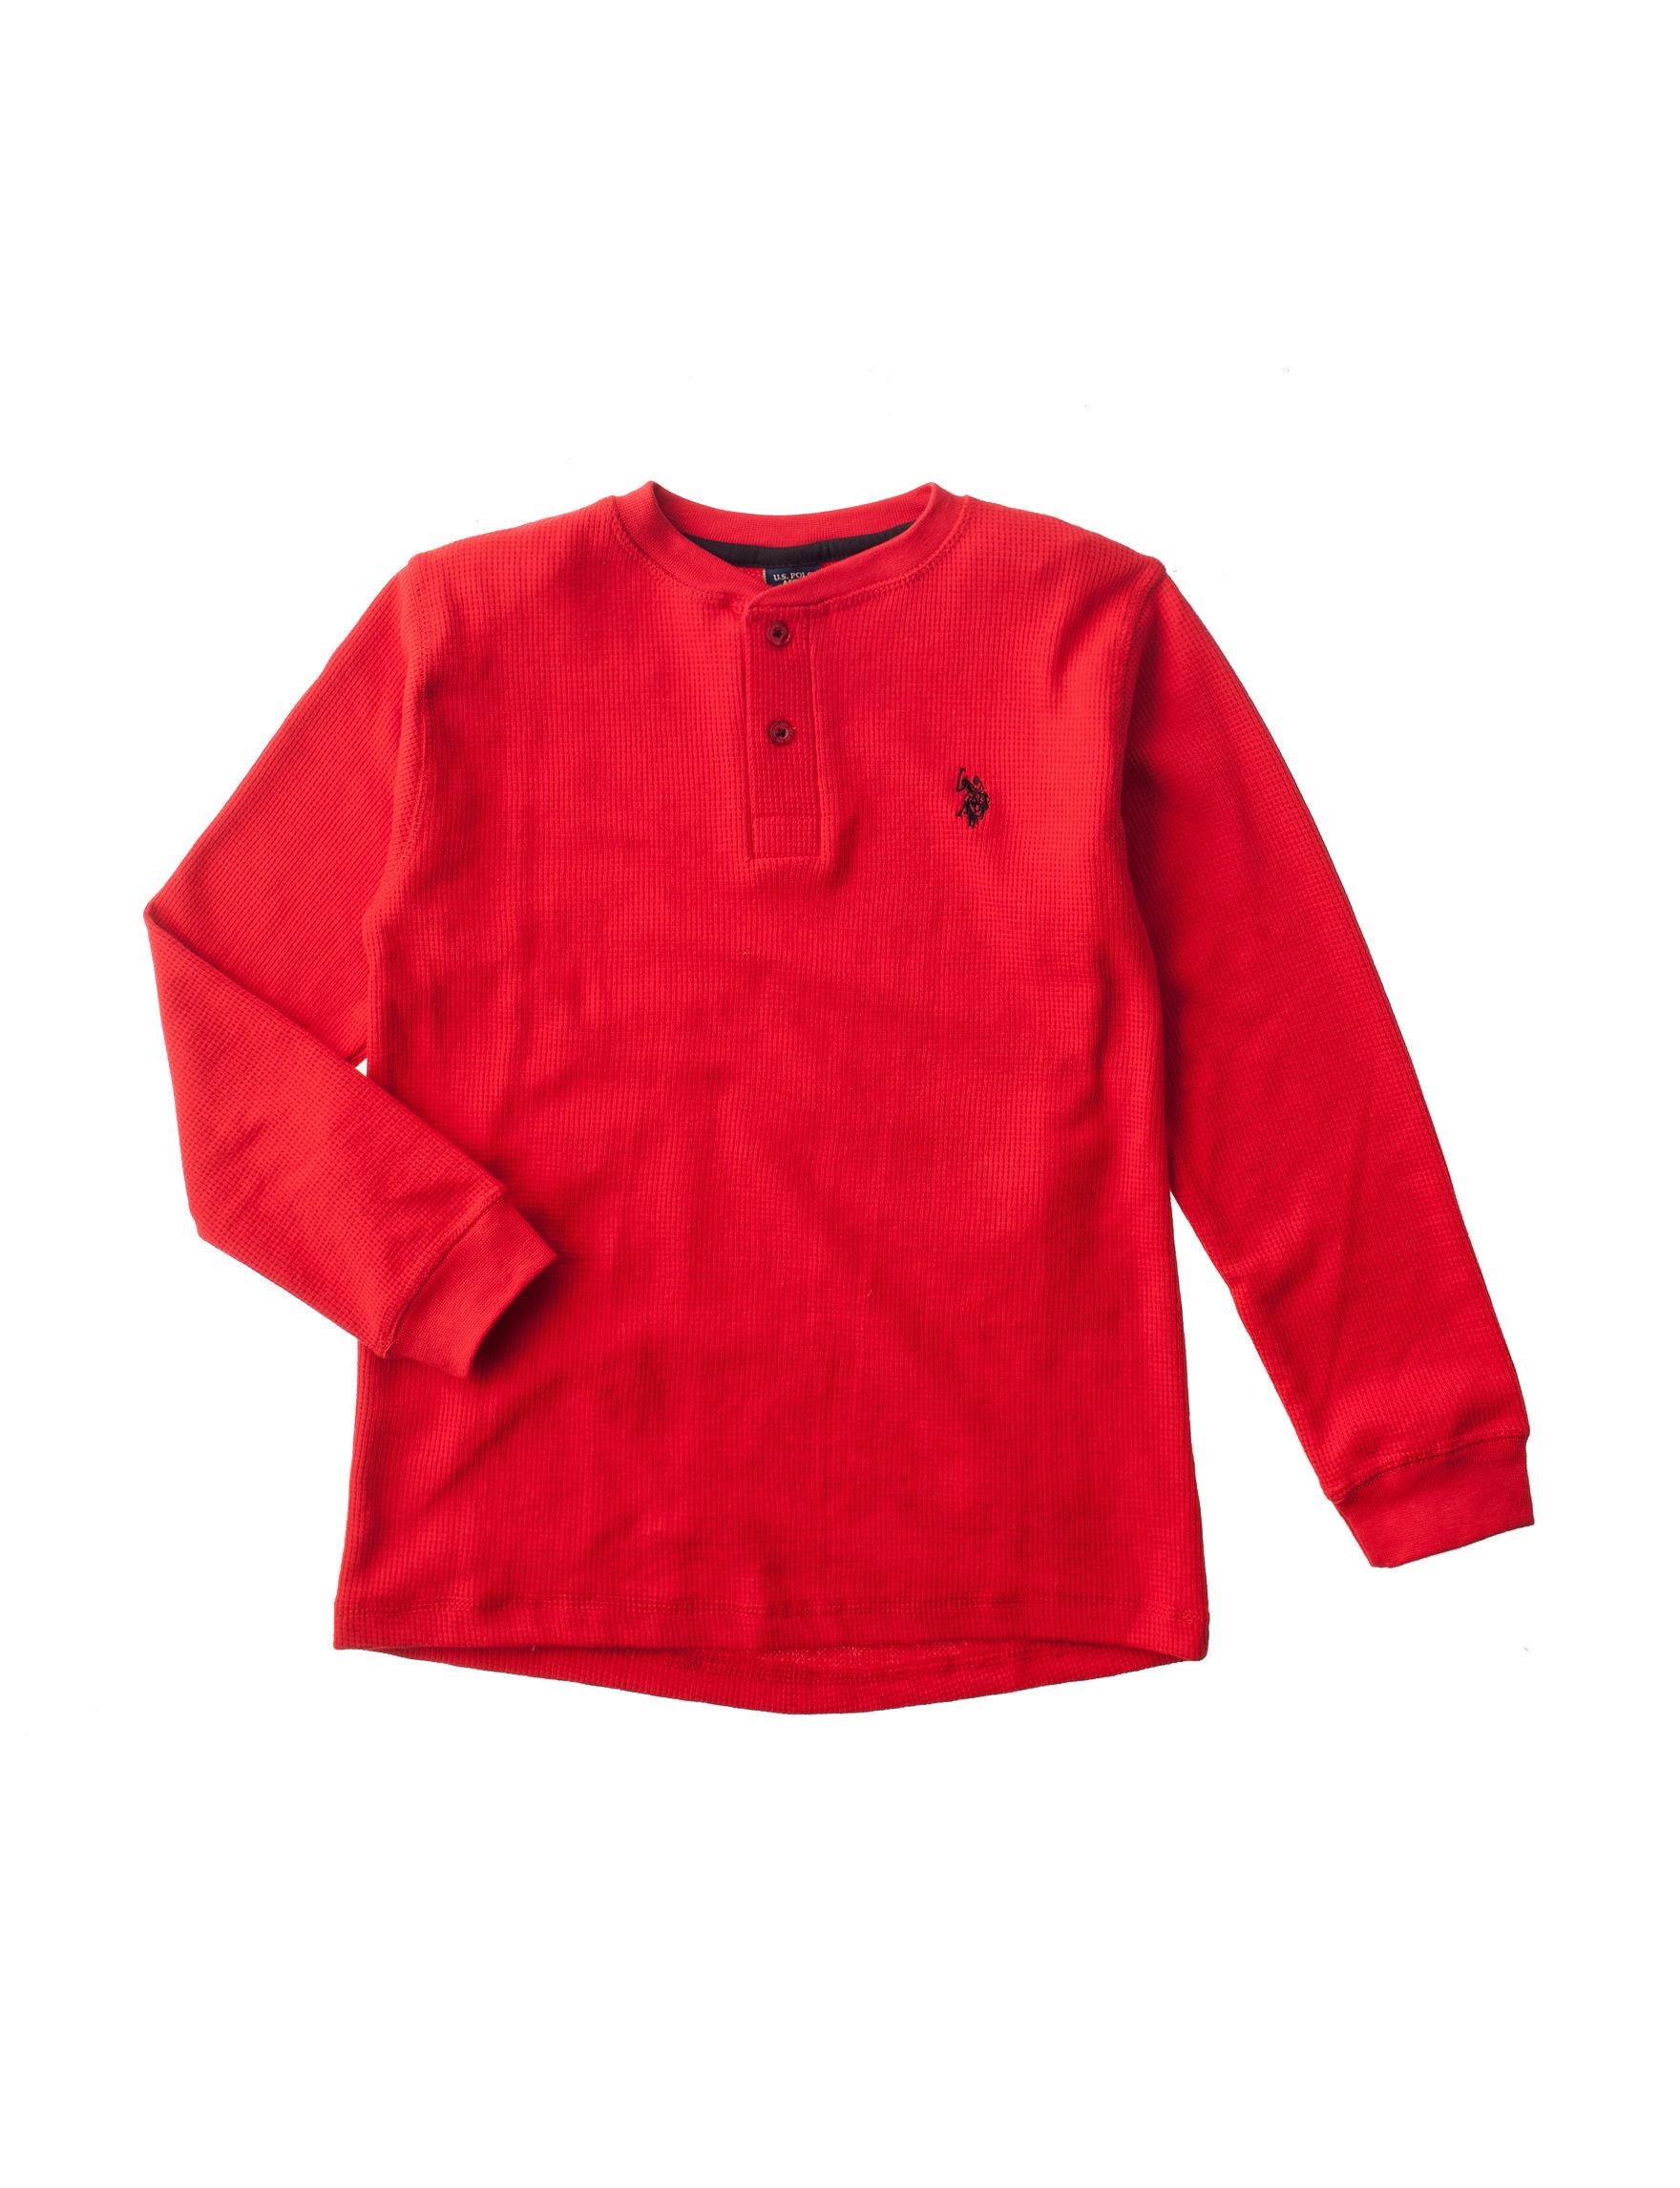 U.S. Polo Assn. Red